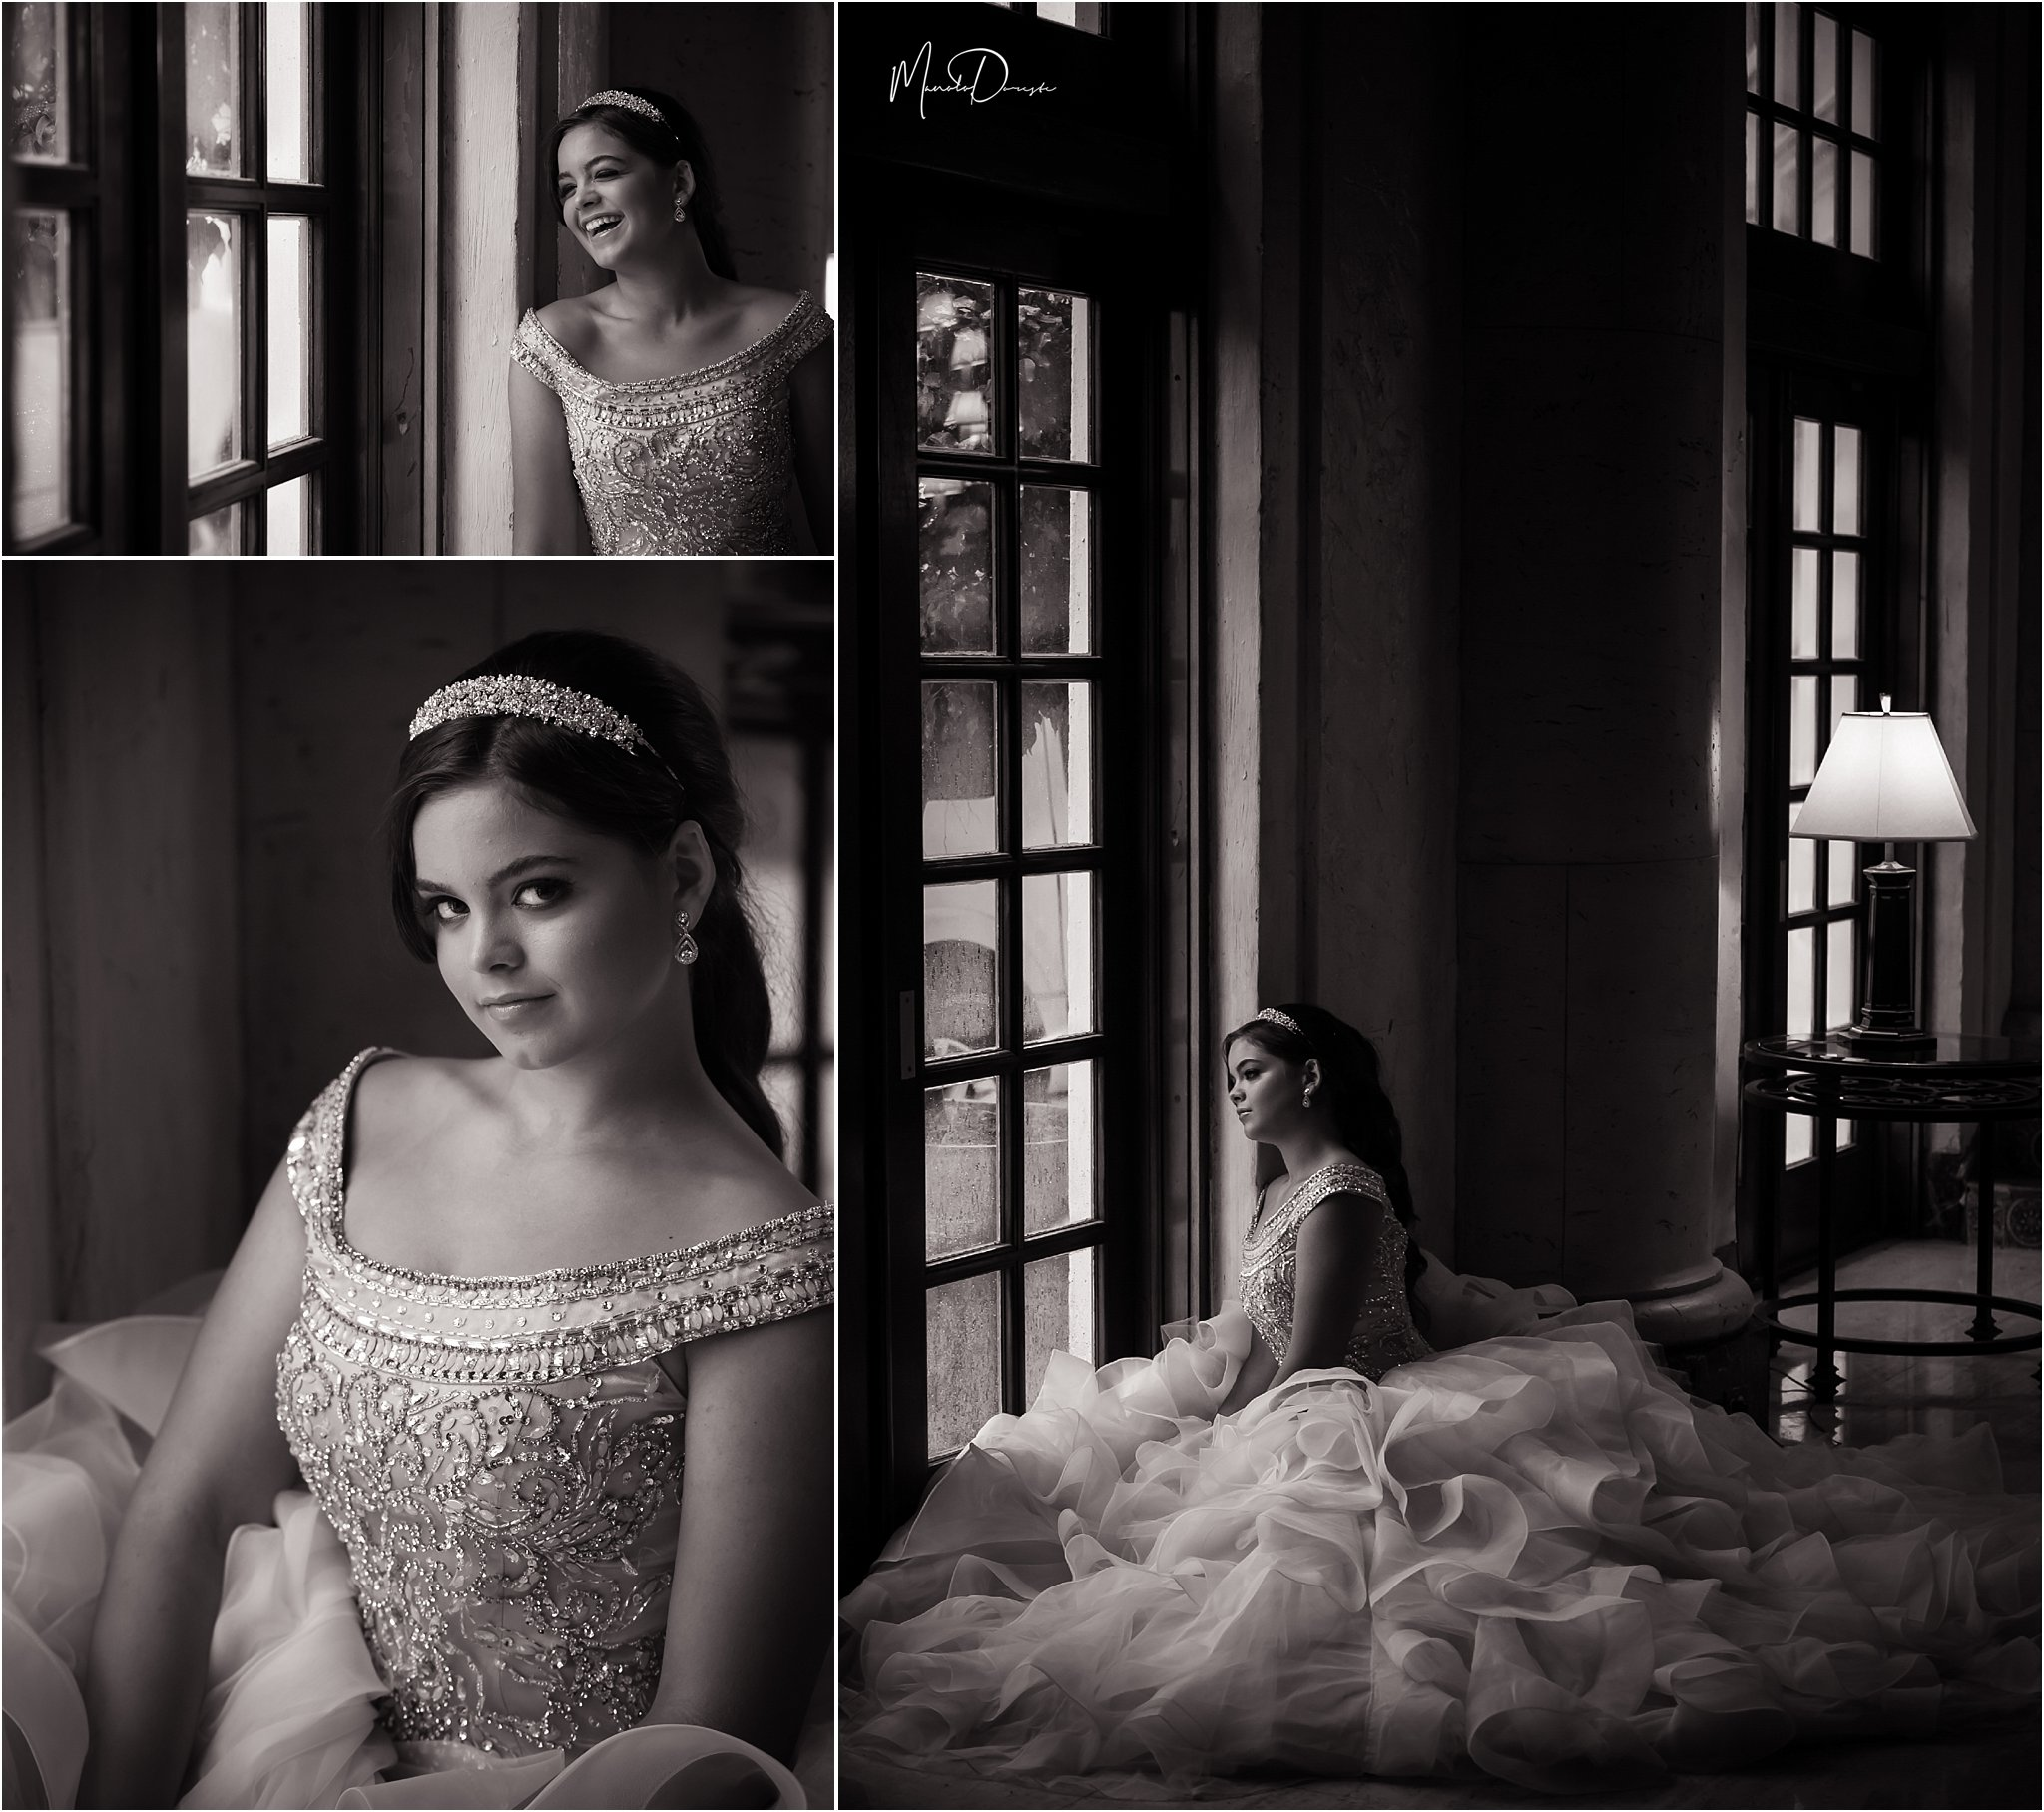 0350_ManoloDoreste_InFocusStudios_Wedding_Family_Photography_Miami_MiamiPhotographer.jpg